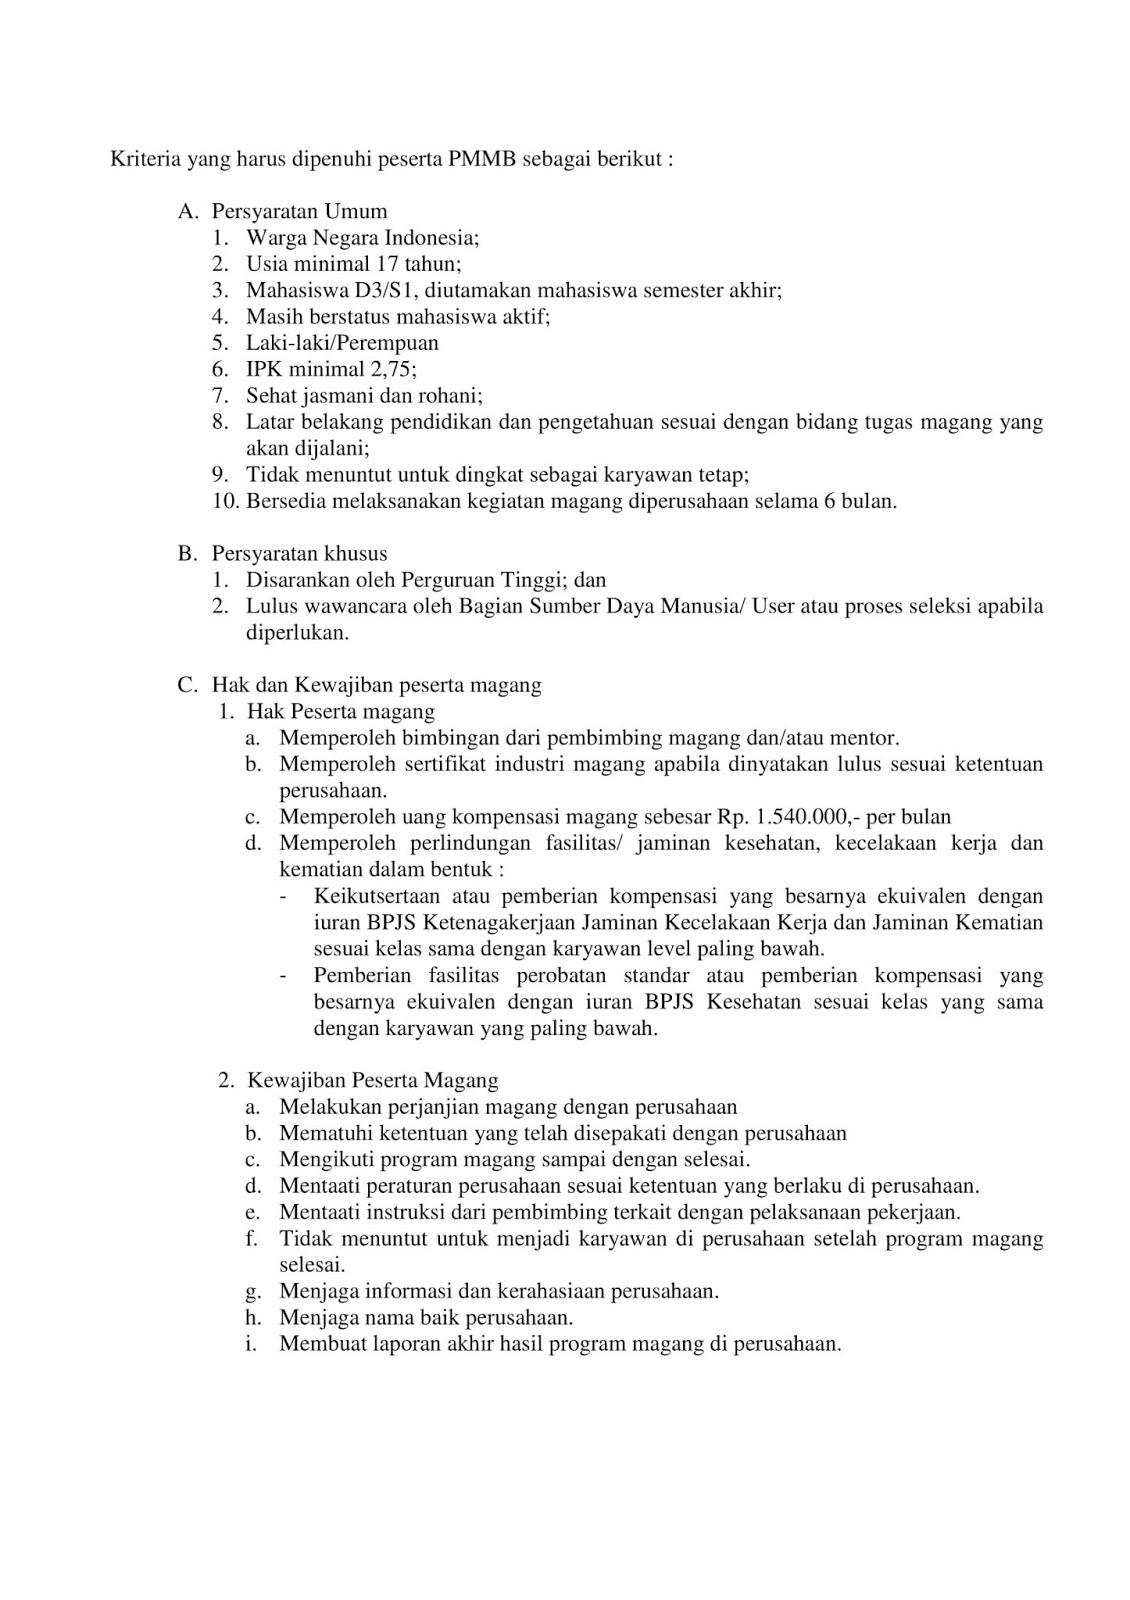 Penerimaan Progam Magang PT Perkebunan Nusantara XII Maret 2019